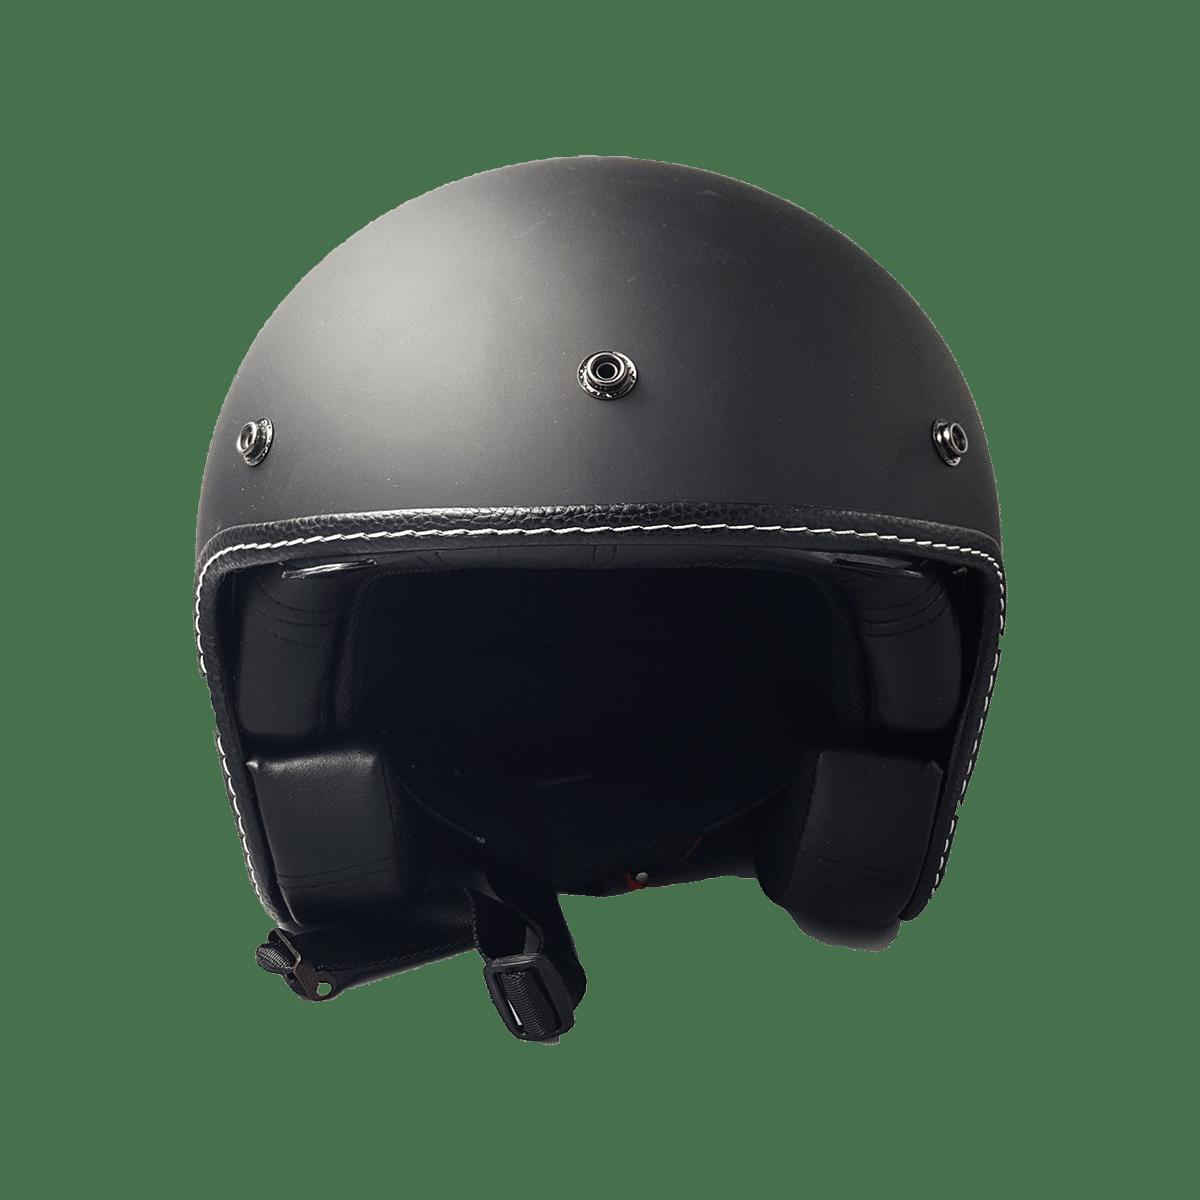 Casque Noir Mat Citycoco M 4